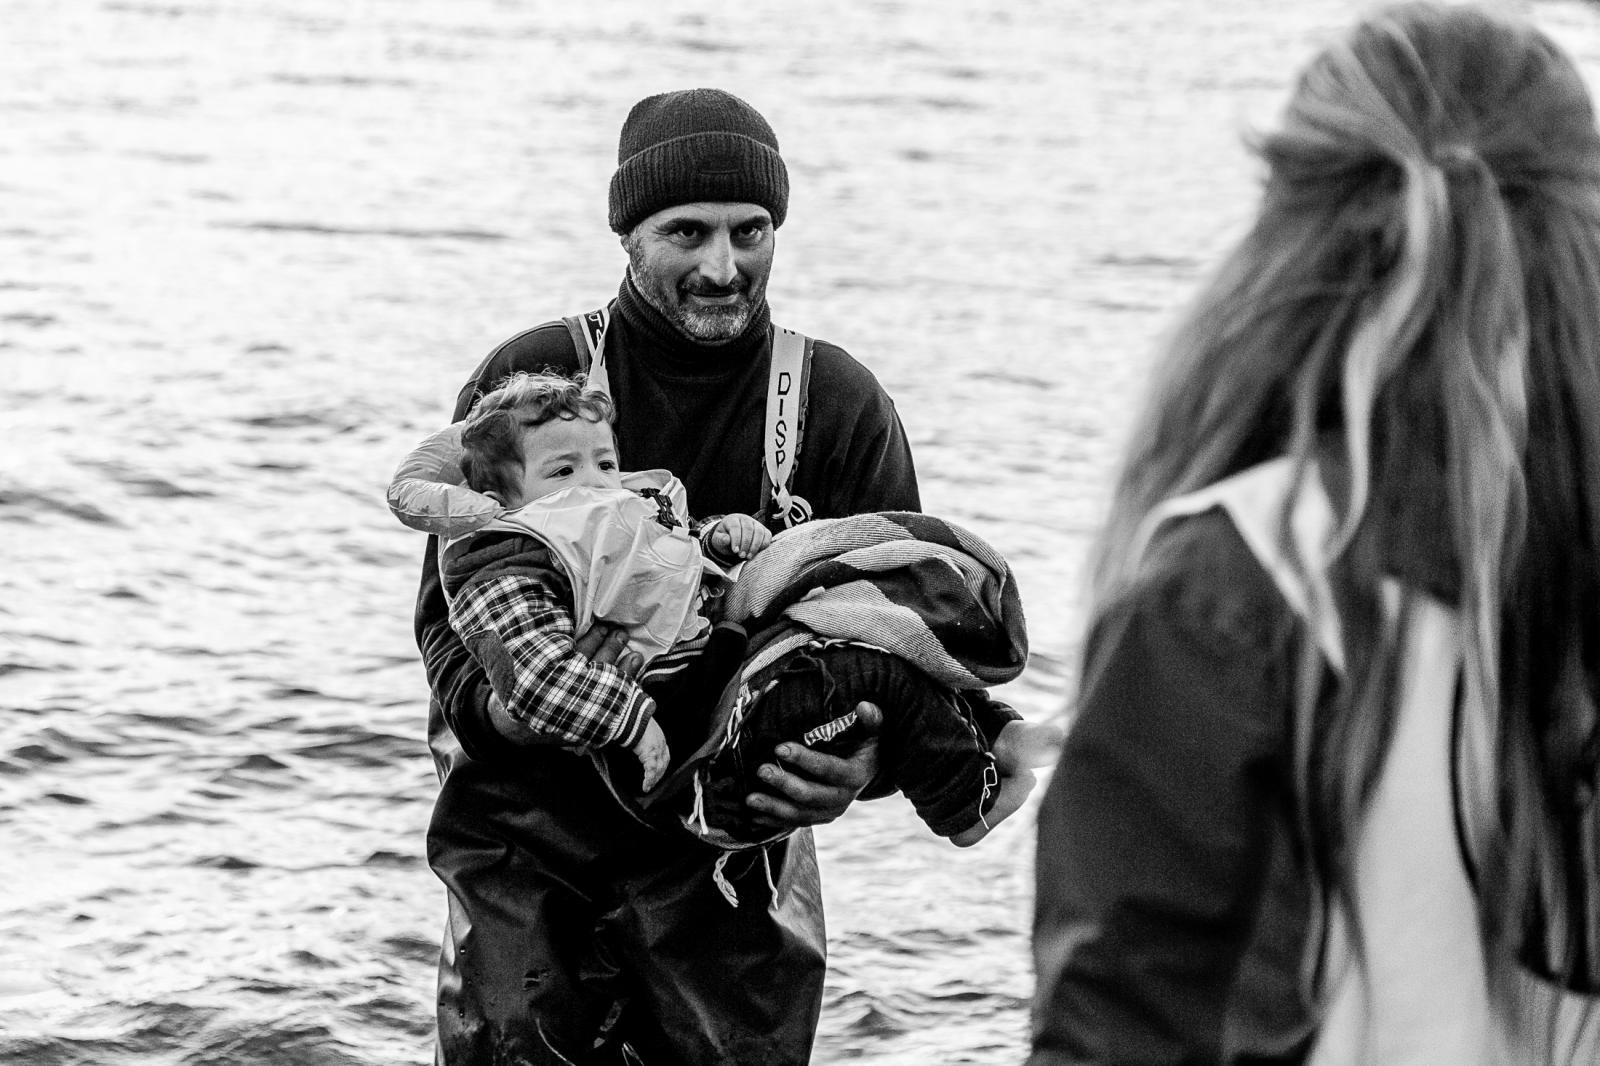 Photography image - Loading 002_Refugee-Crisis-Greece-Omar-Havana.jpg